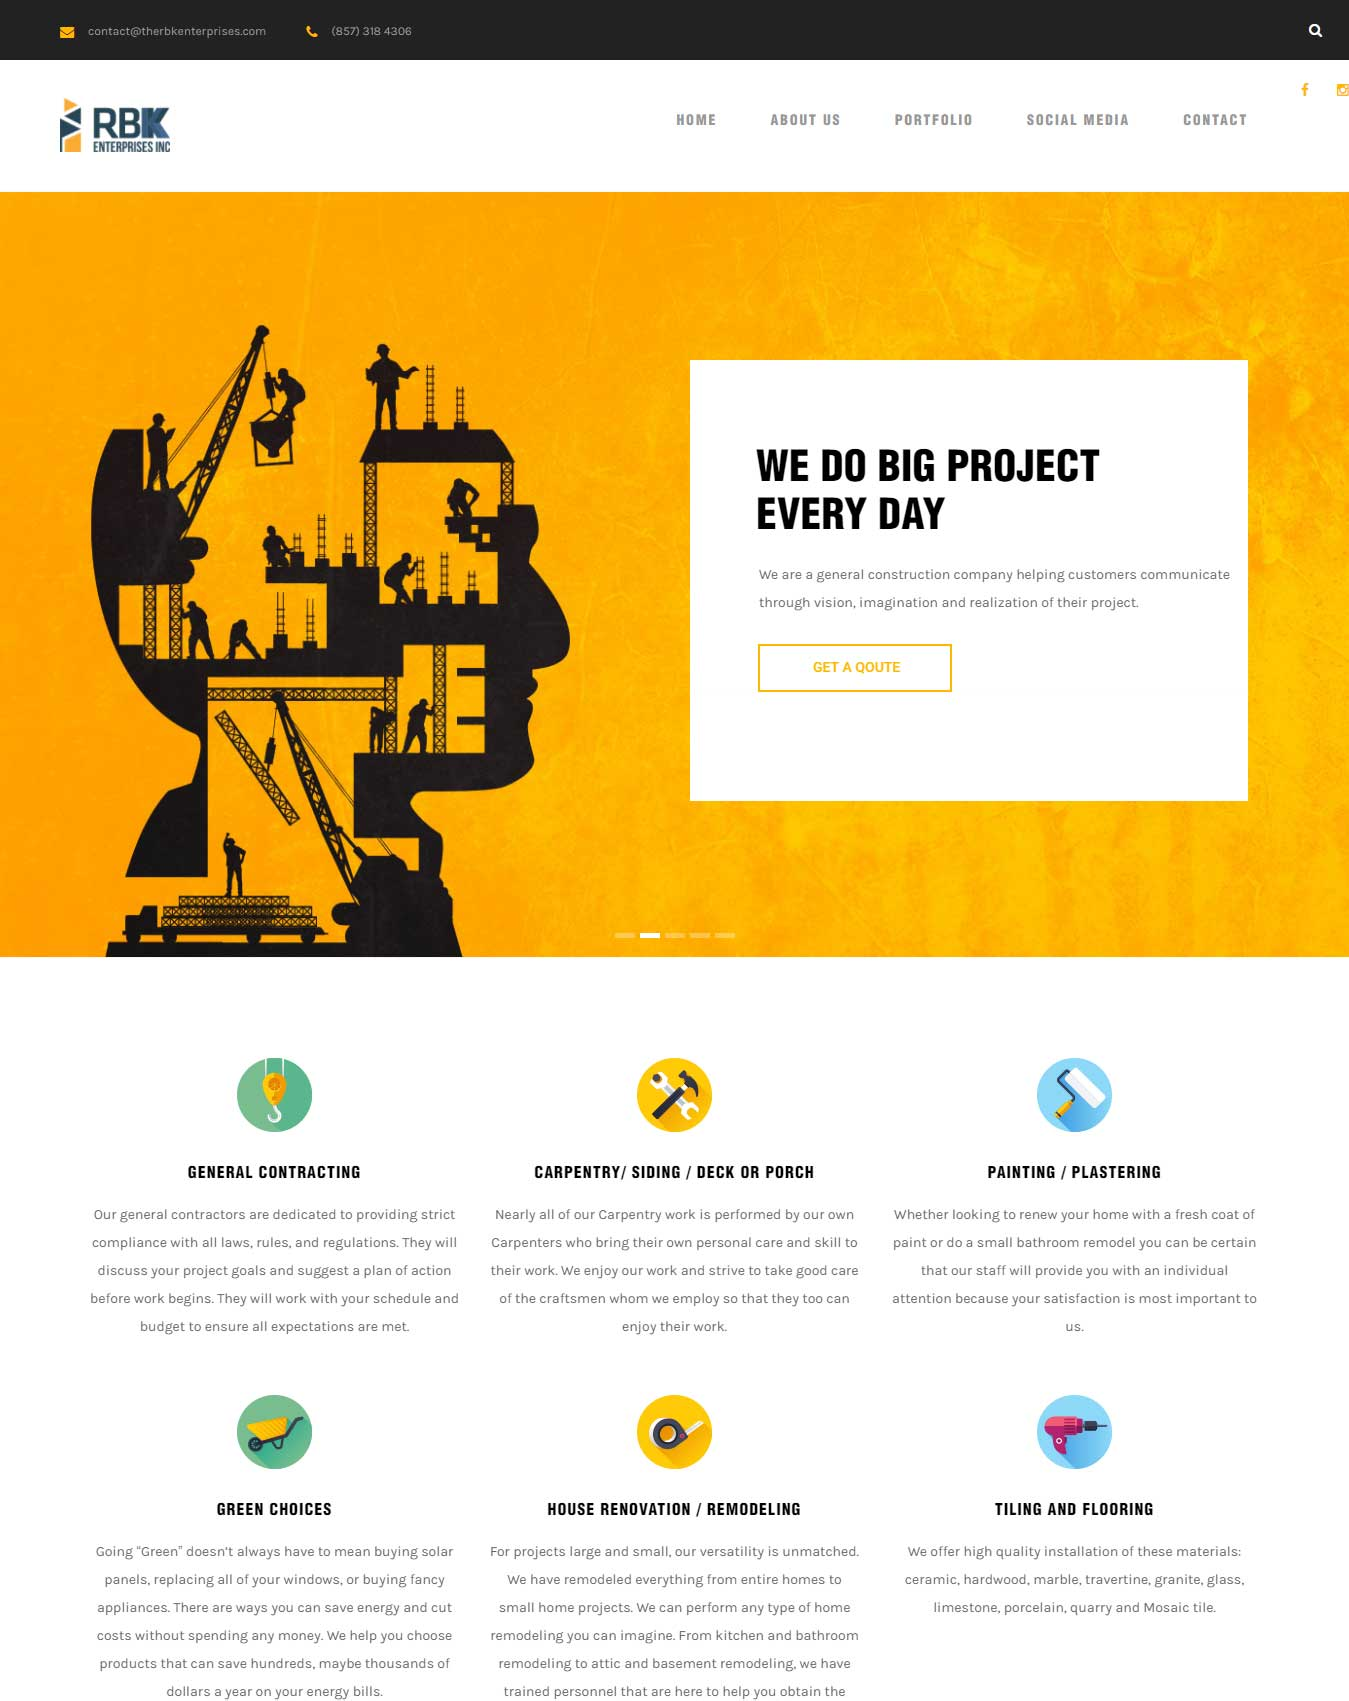 website the rbk enterprises